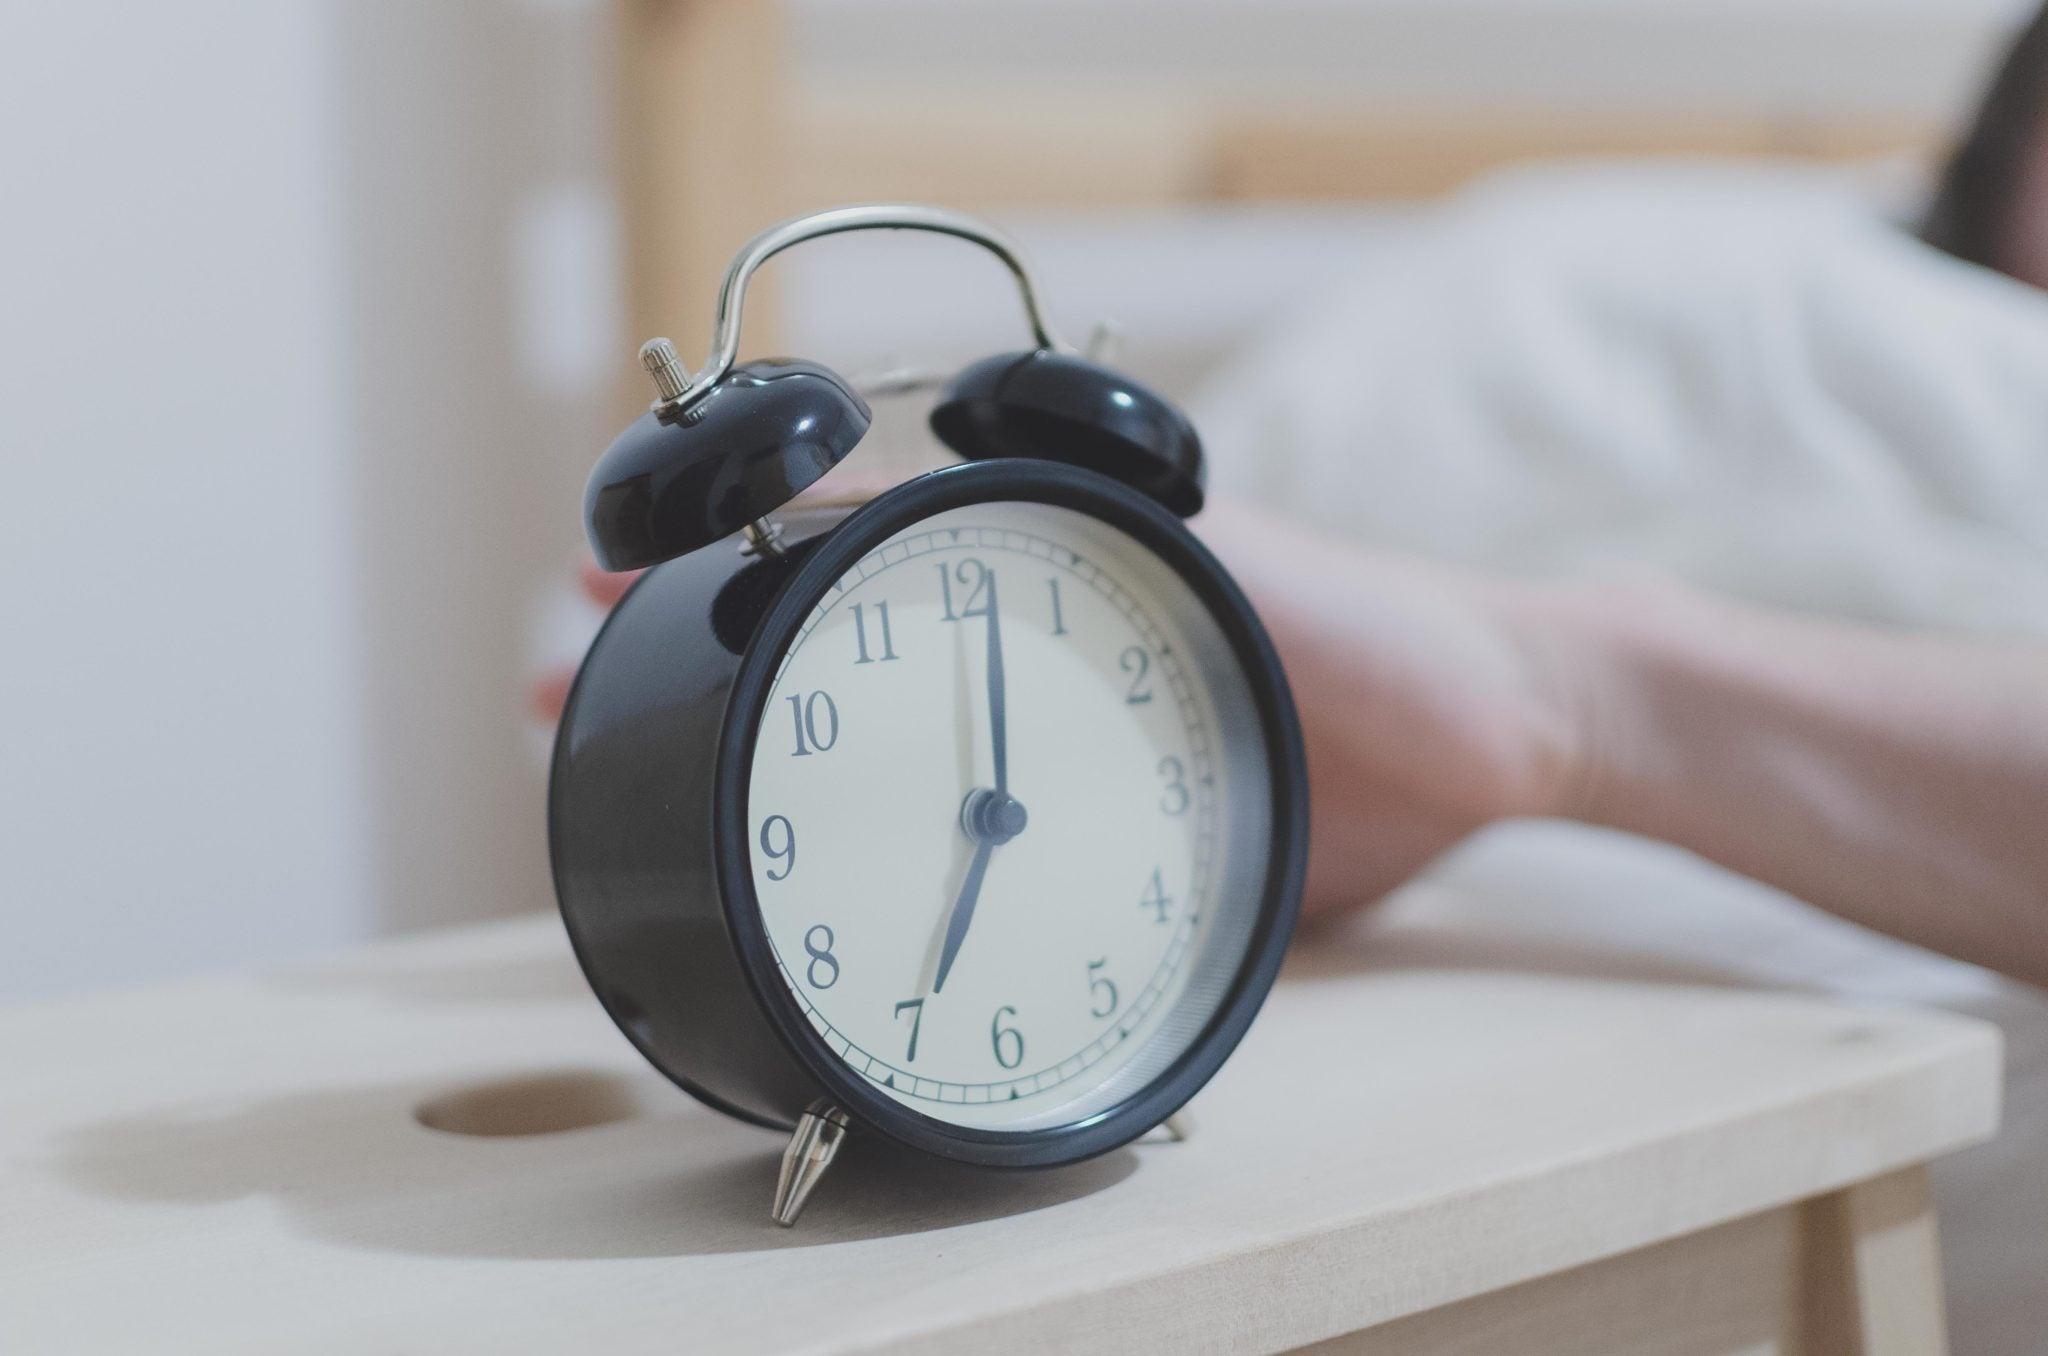 Daylight Savings Ends - How's Your Sleep? 2